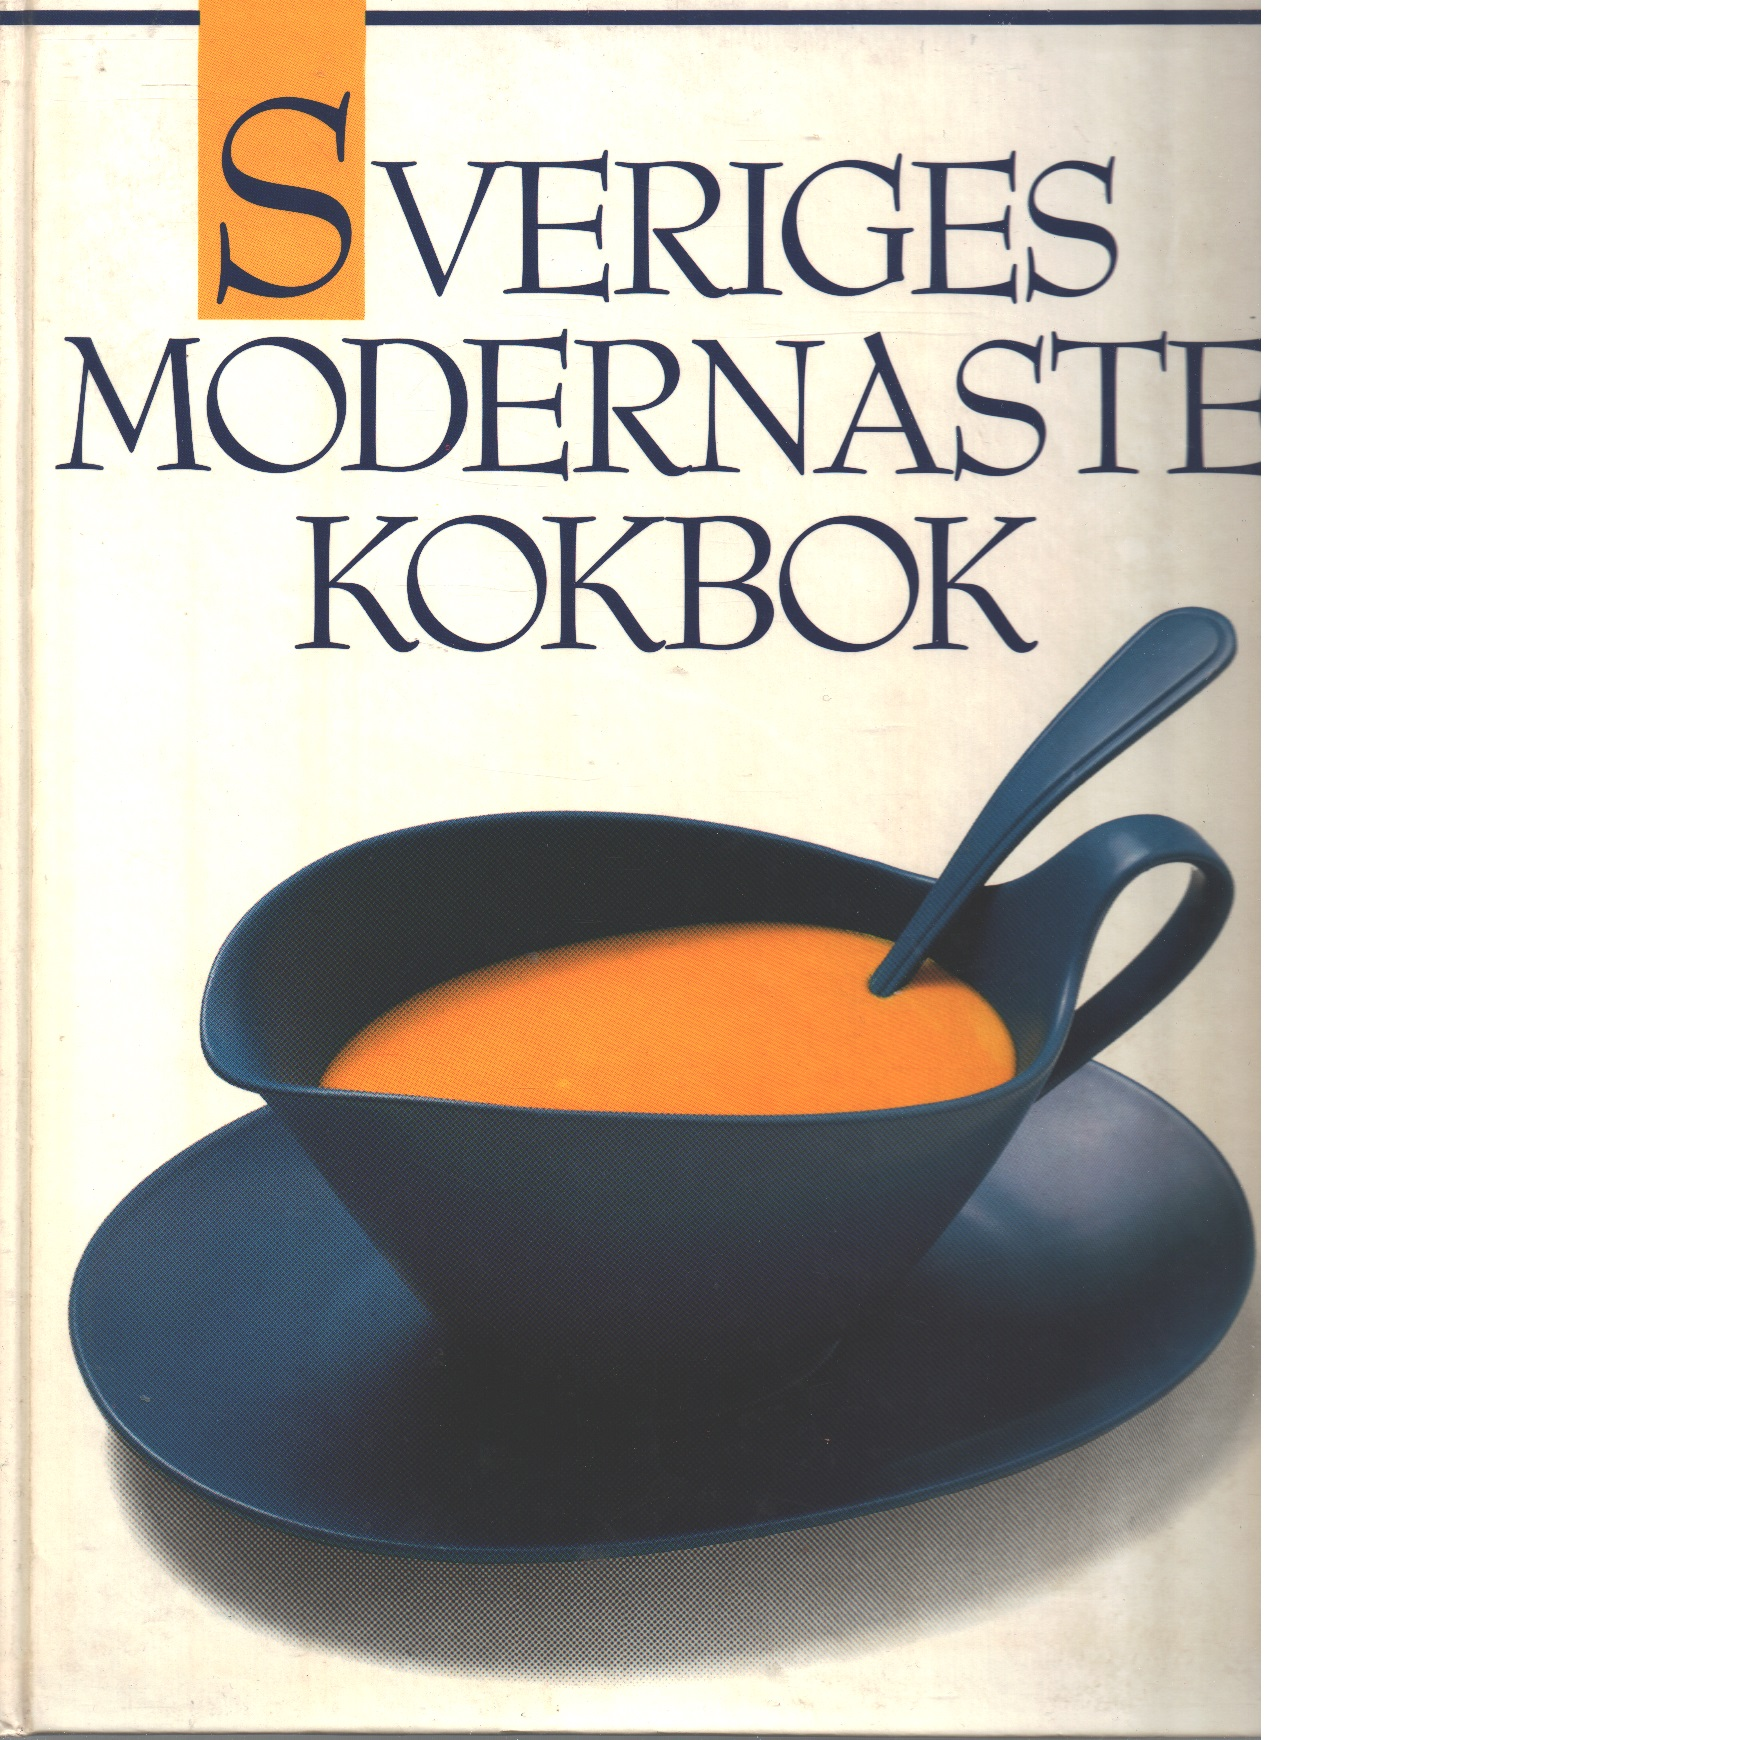 Sveriges modernaste kokbok - Red.